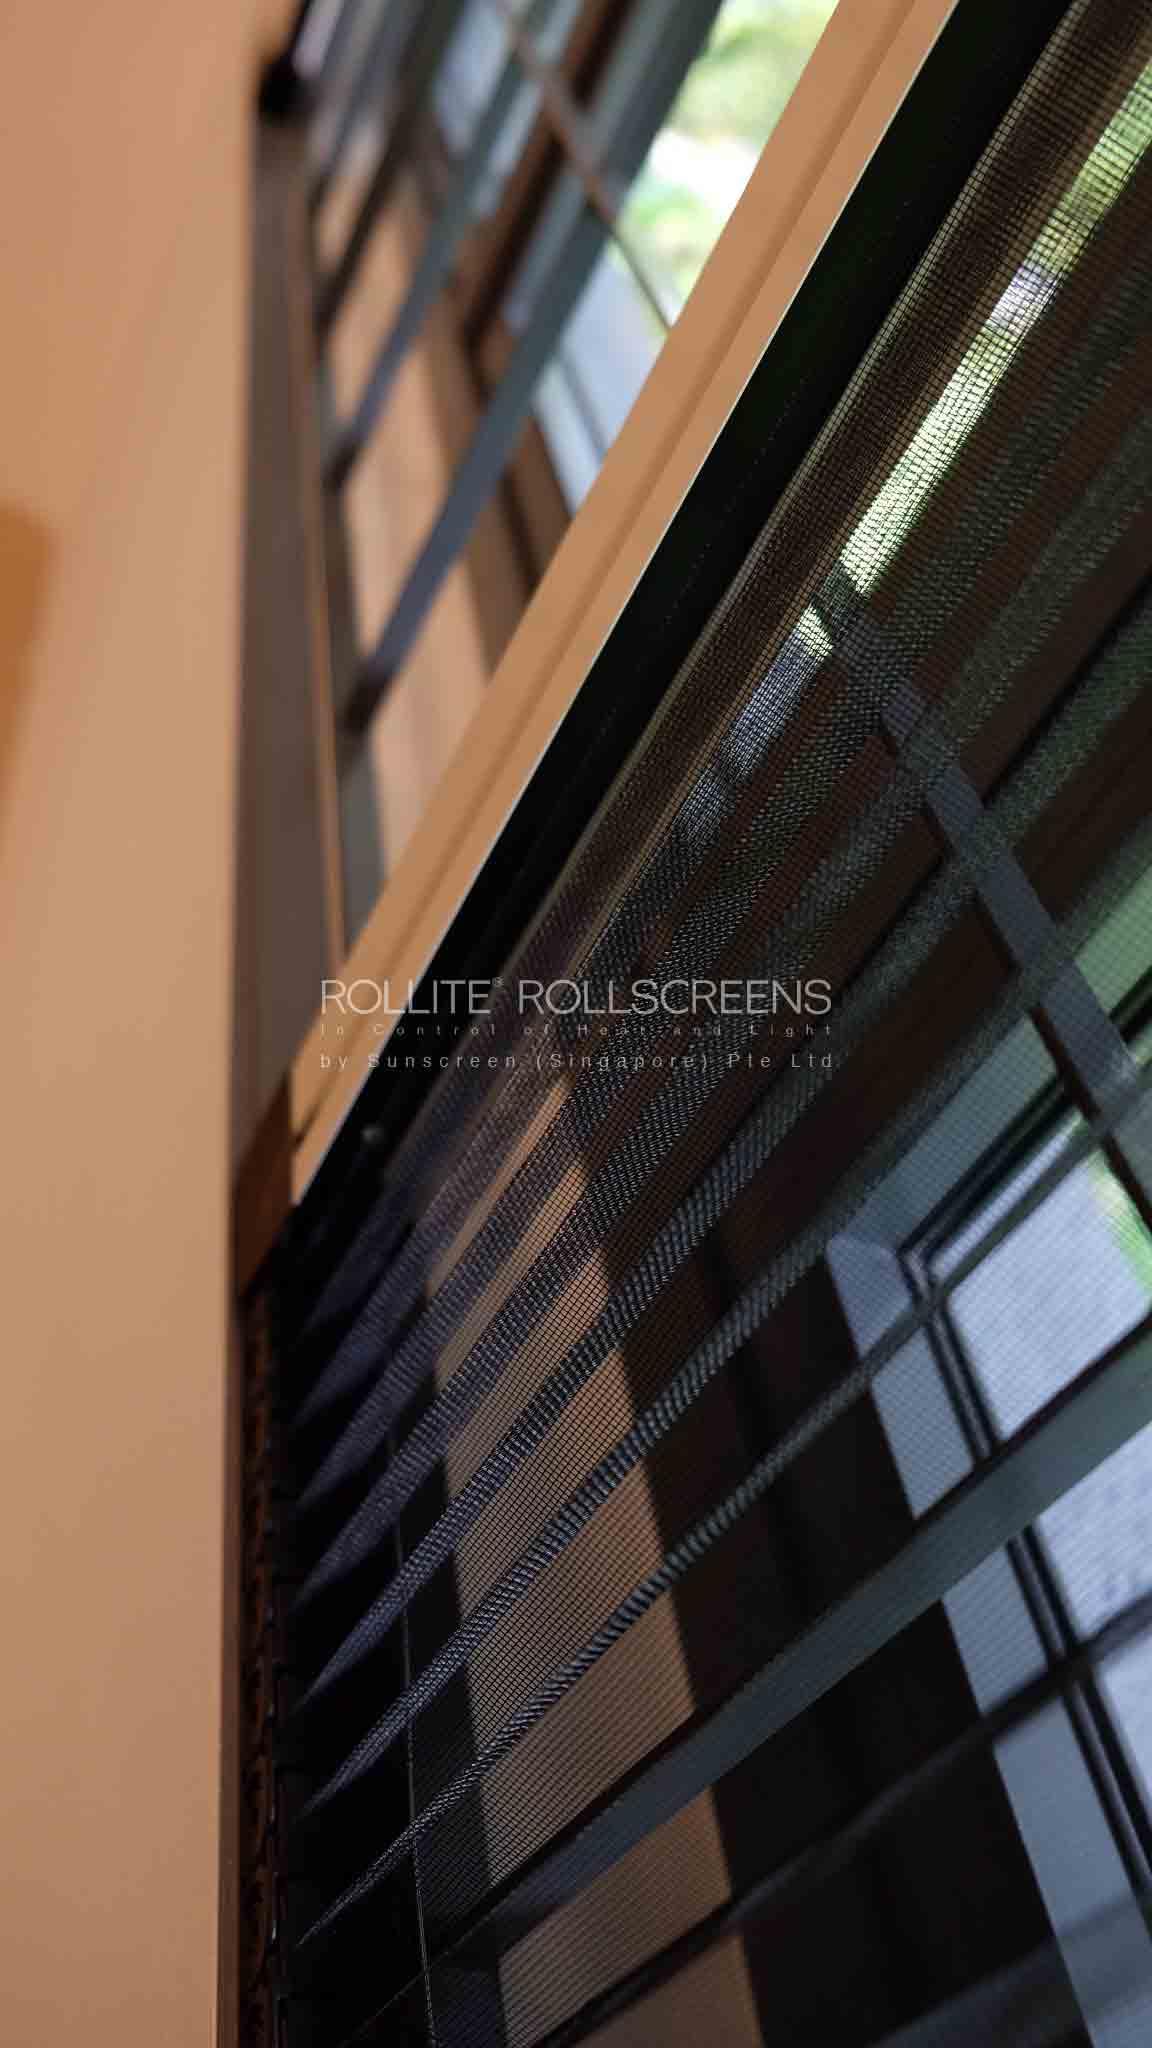 Sunscreen-Singapore_Rollite-Rollscreens-45